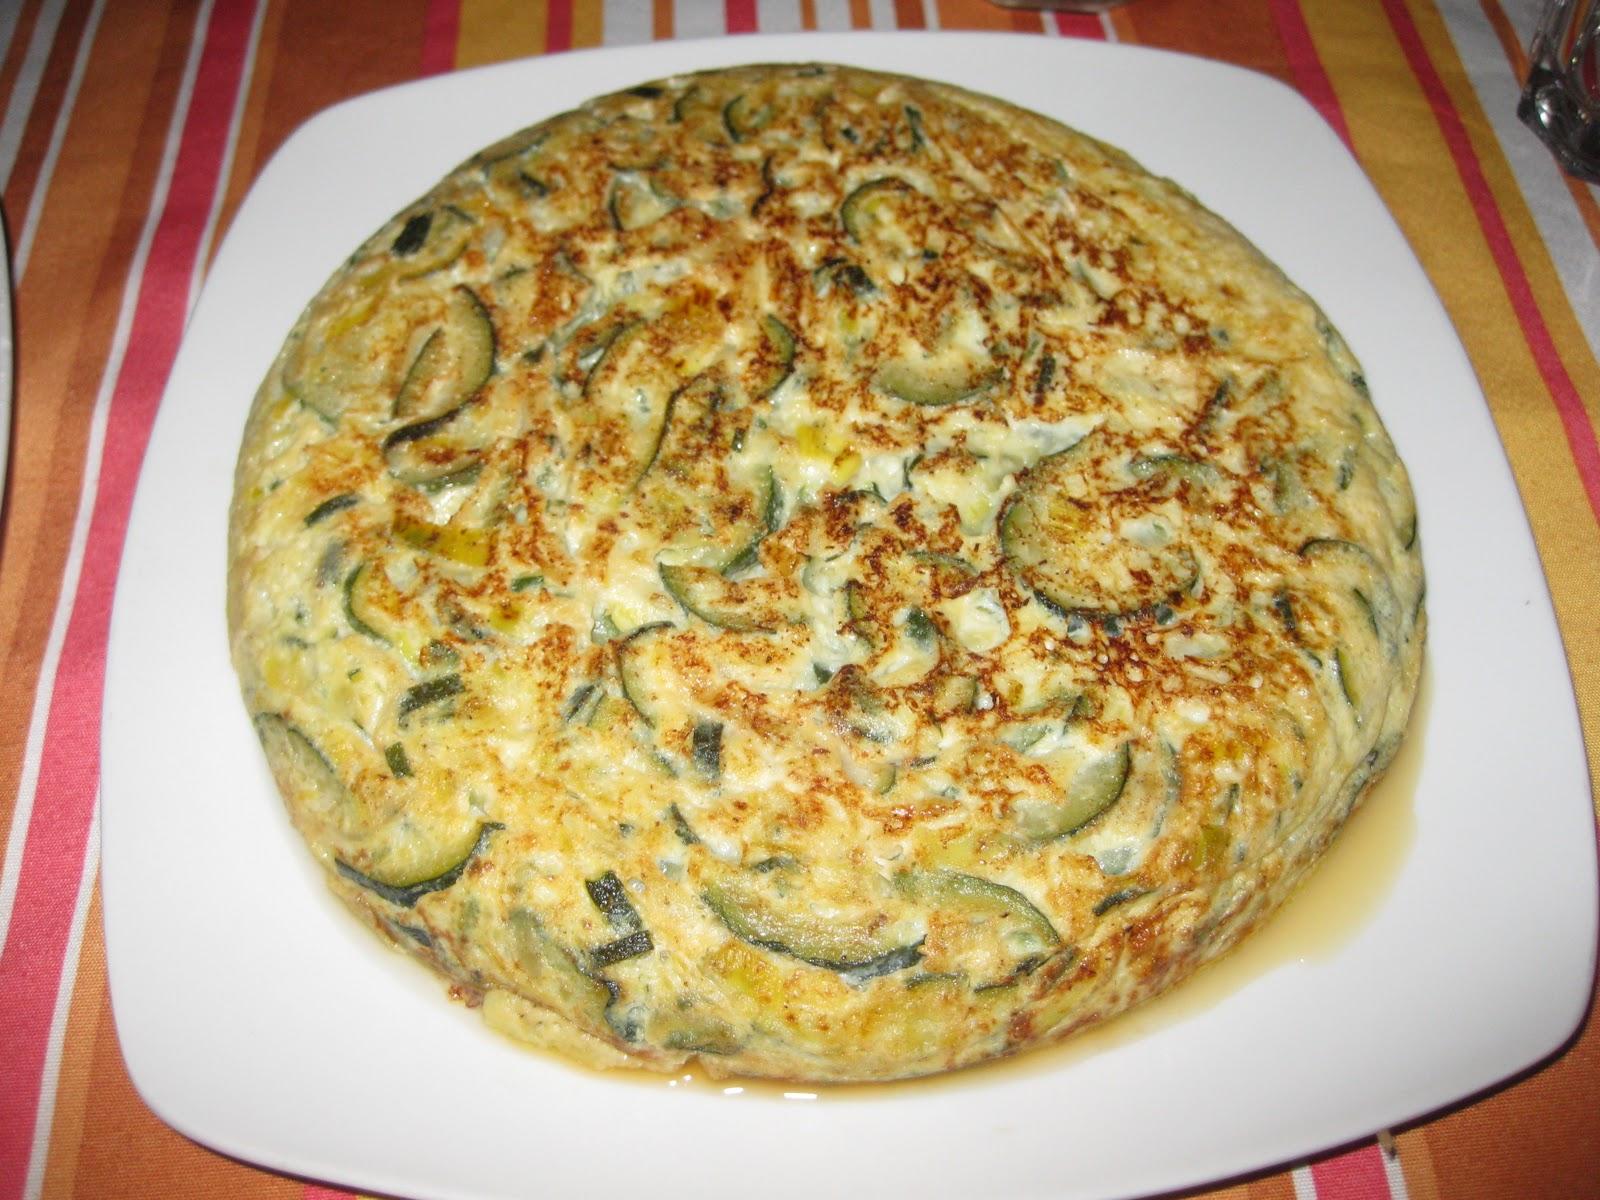 Alquimia fullera transitando tortilla de calabacin - Tortilla de calabacin y cebolla ...